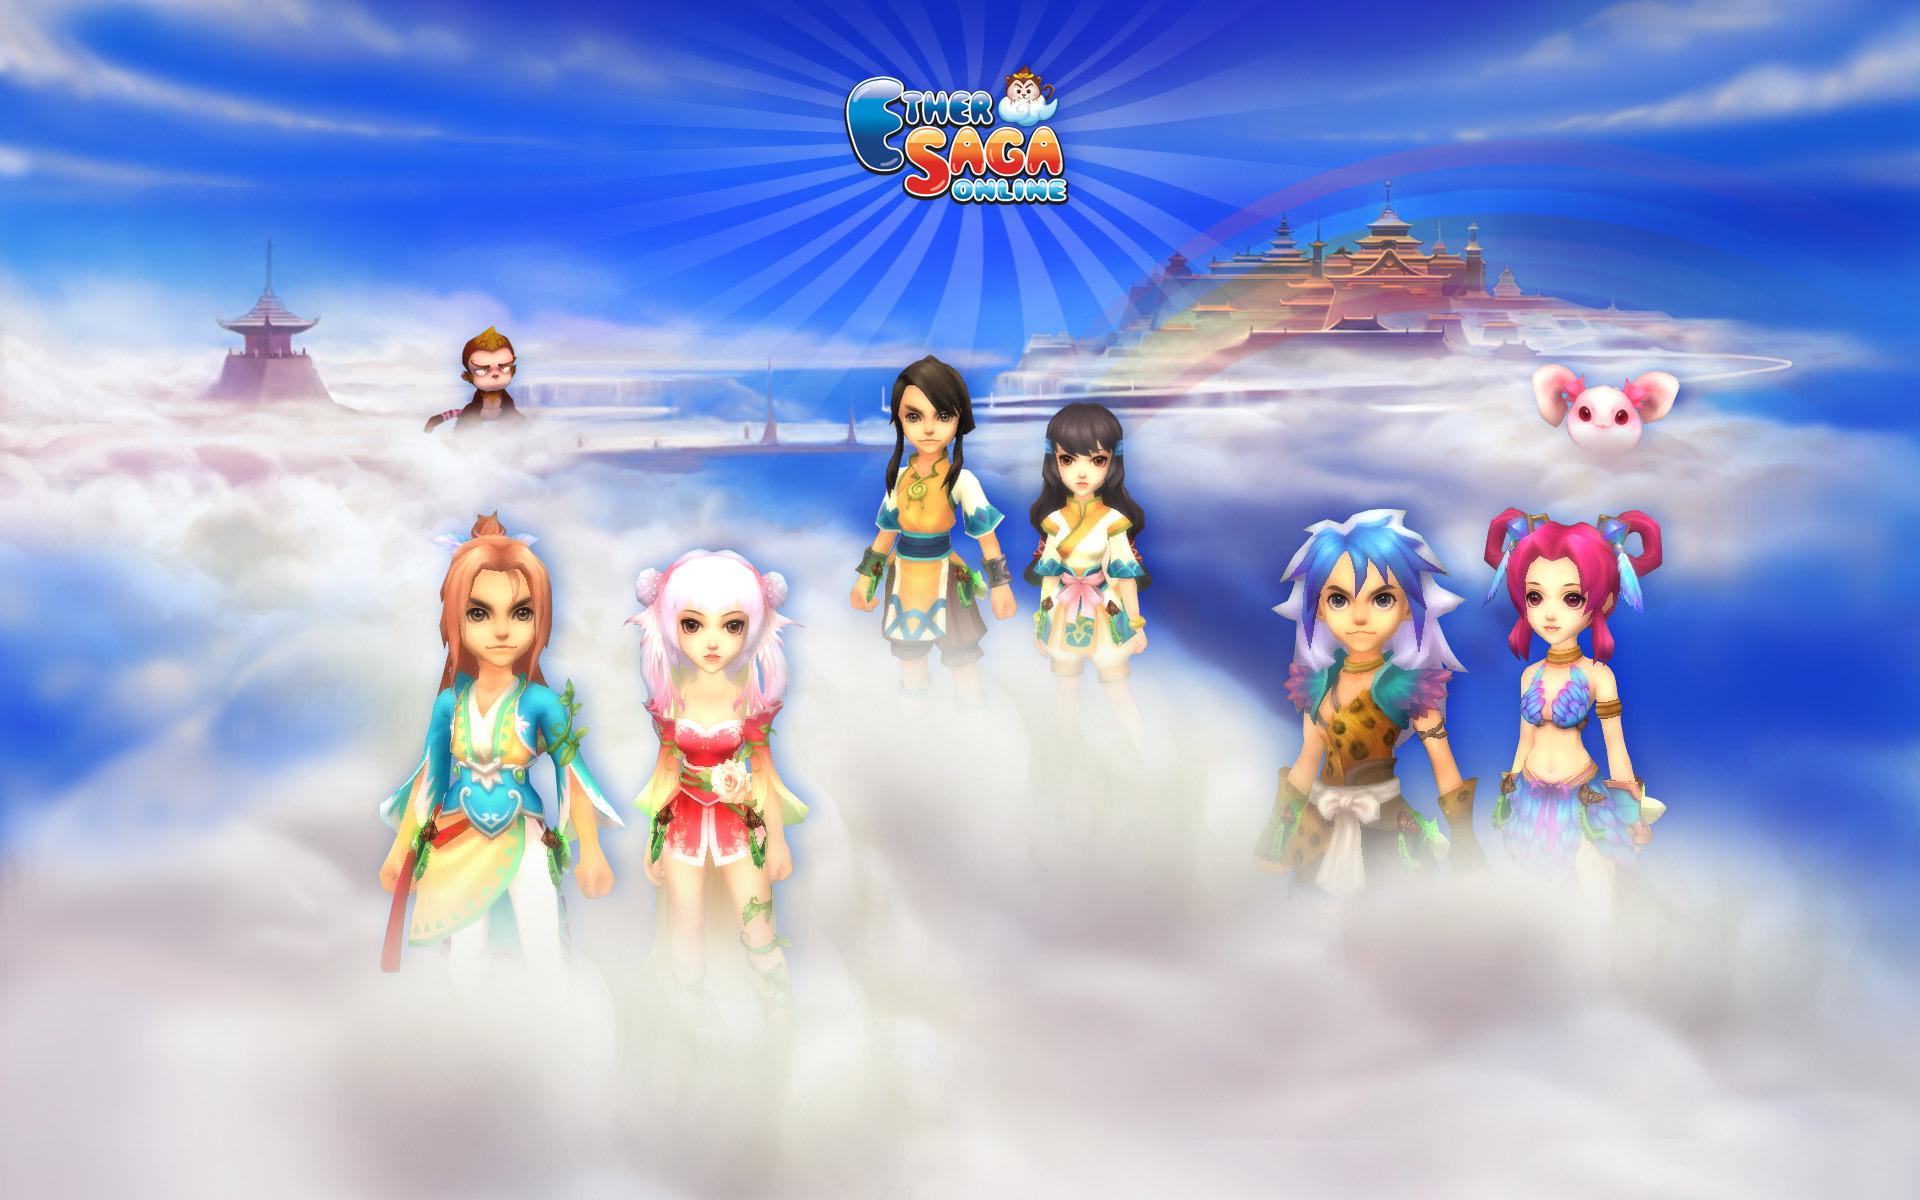 Ether Saga Online wallpaper